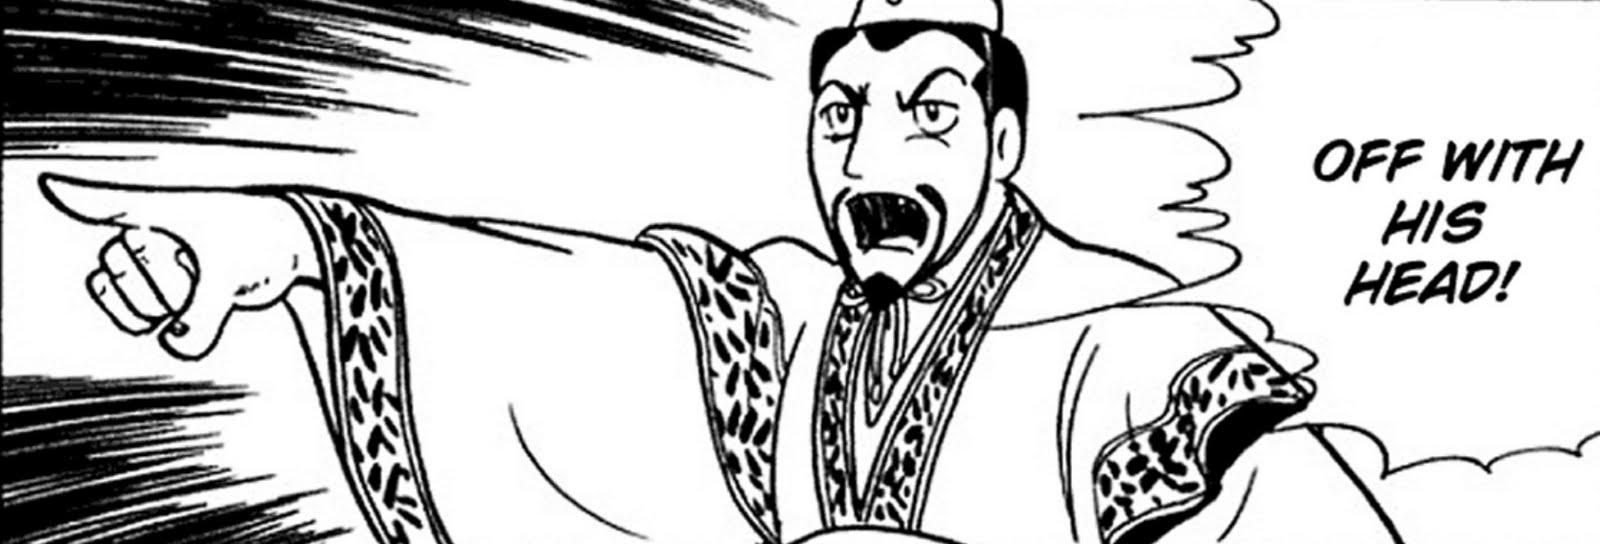 Hox Scanlations: Sangokushi v25 (will finish by June 17 no